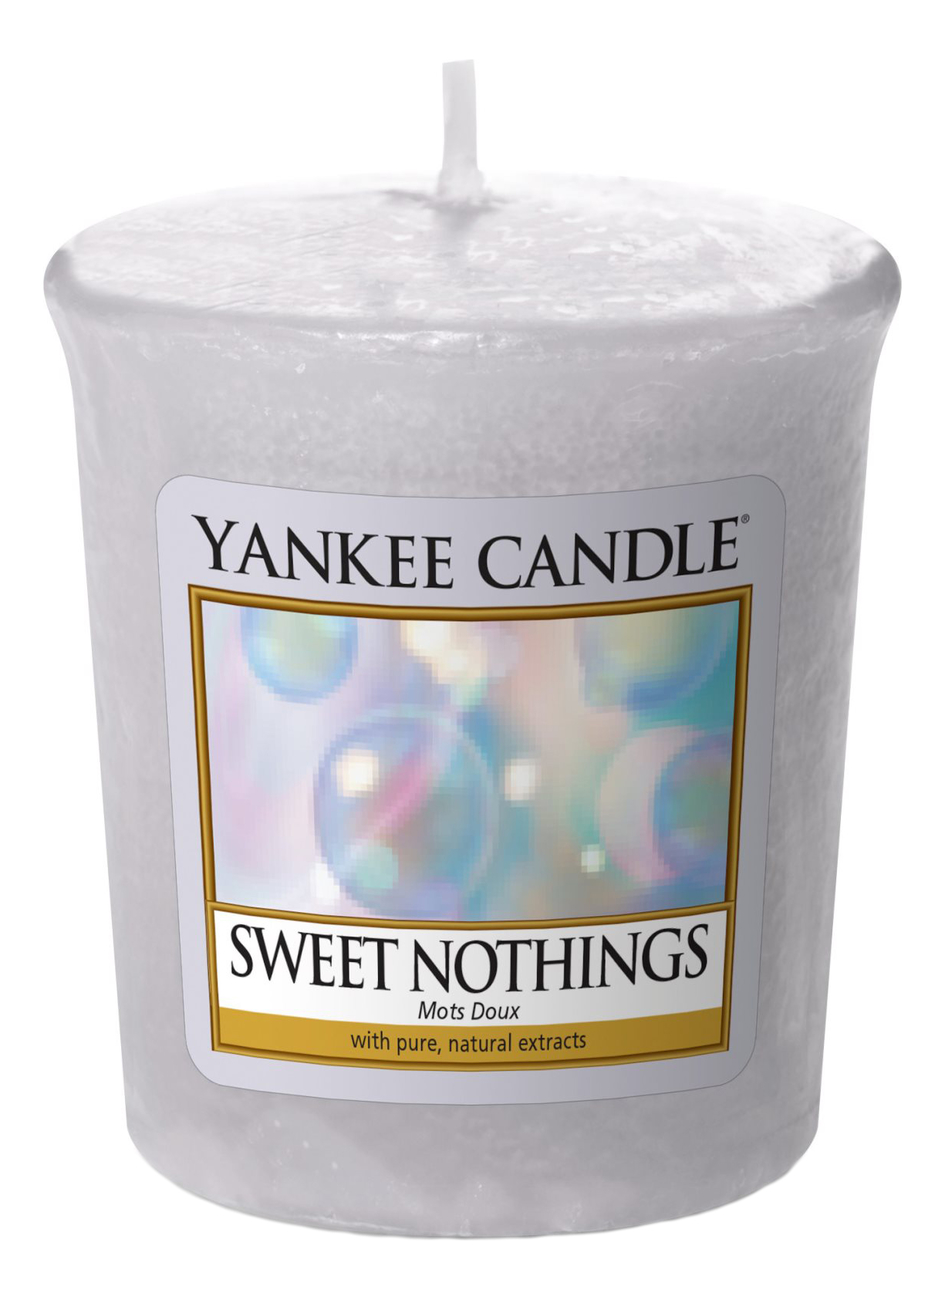 Купить Ароматическая свеча Sweet Nothings: Свеча 49г, Yankee Candle